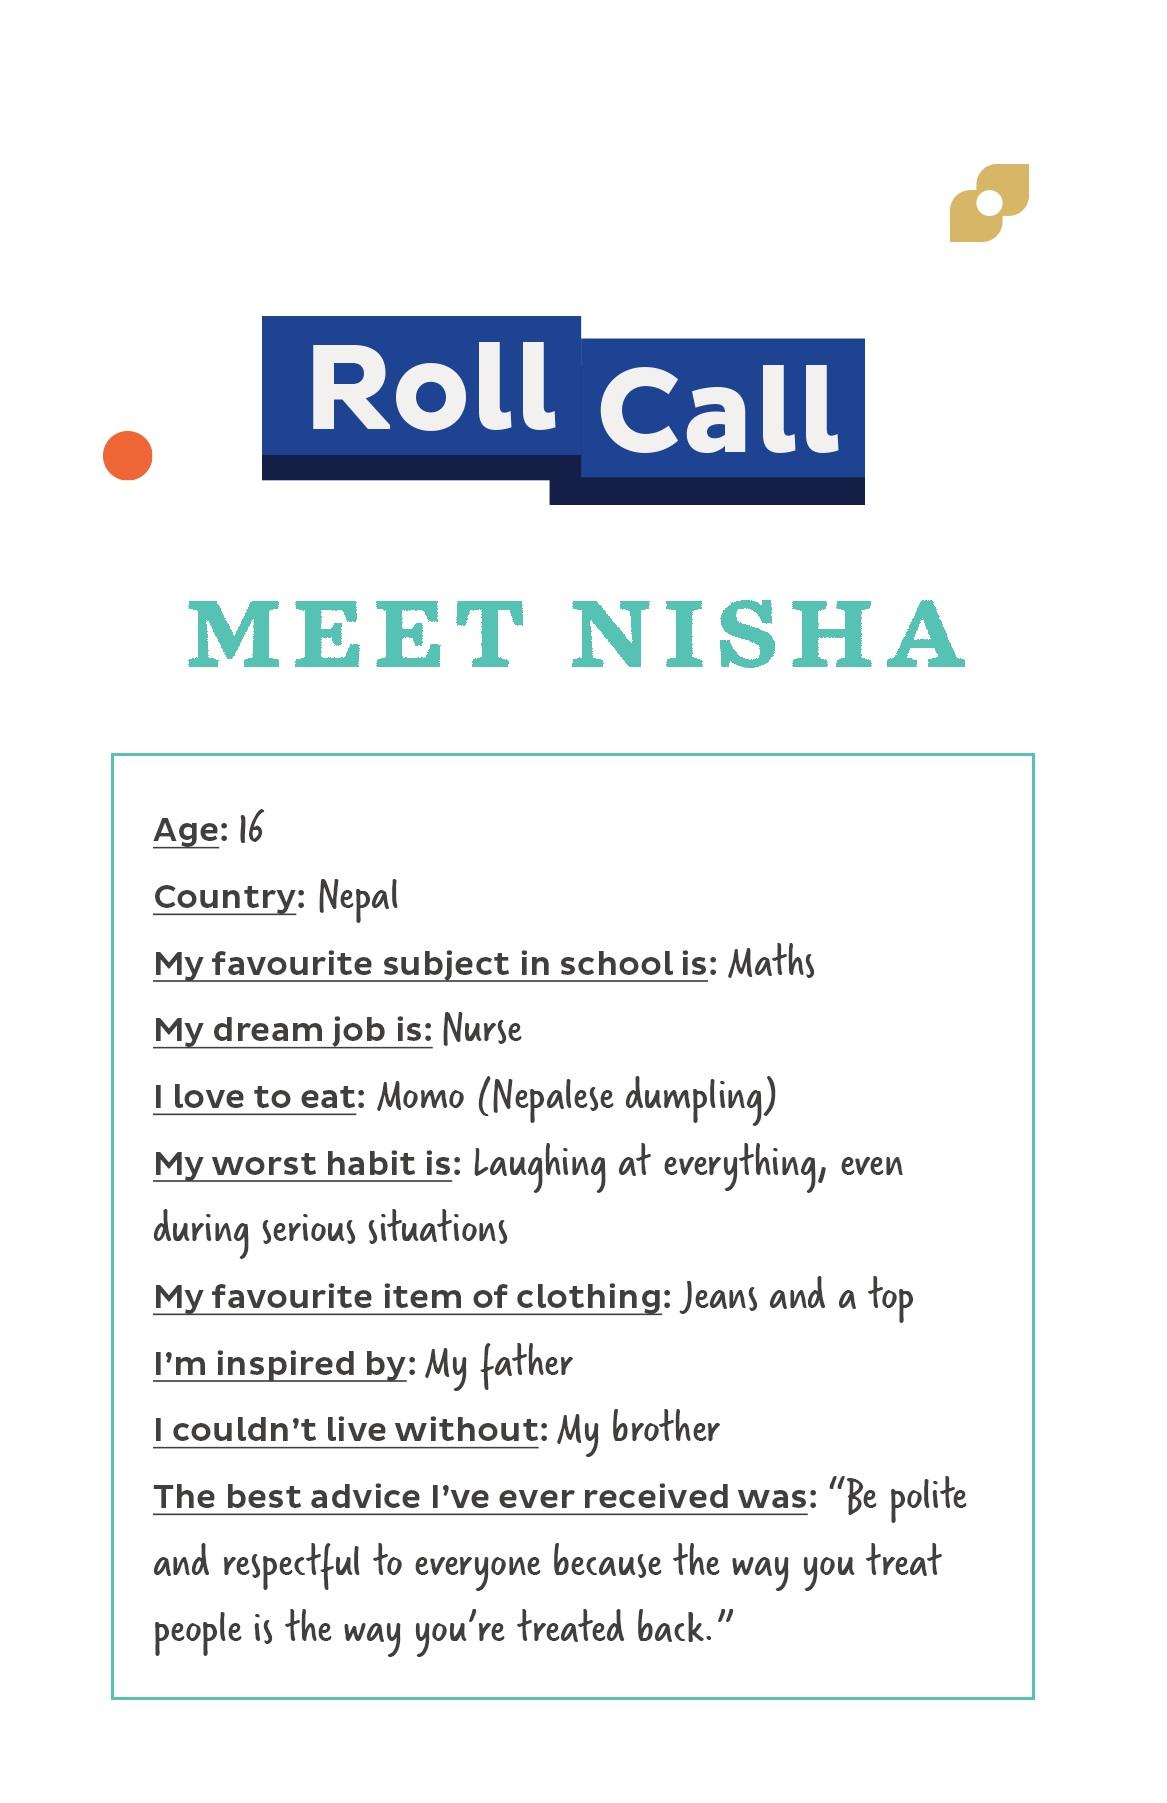 RollCall_FastFacts_Nisha.jpg